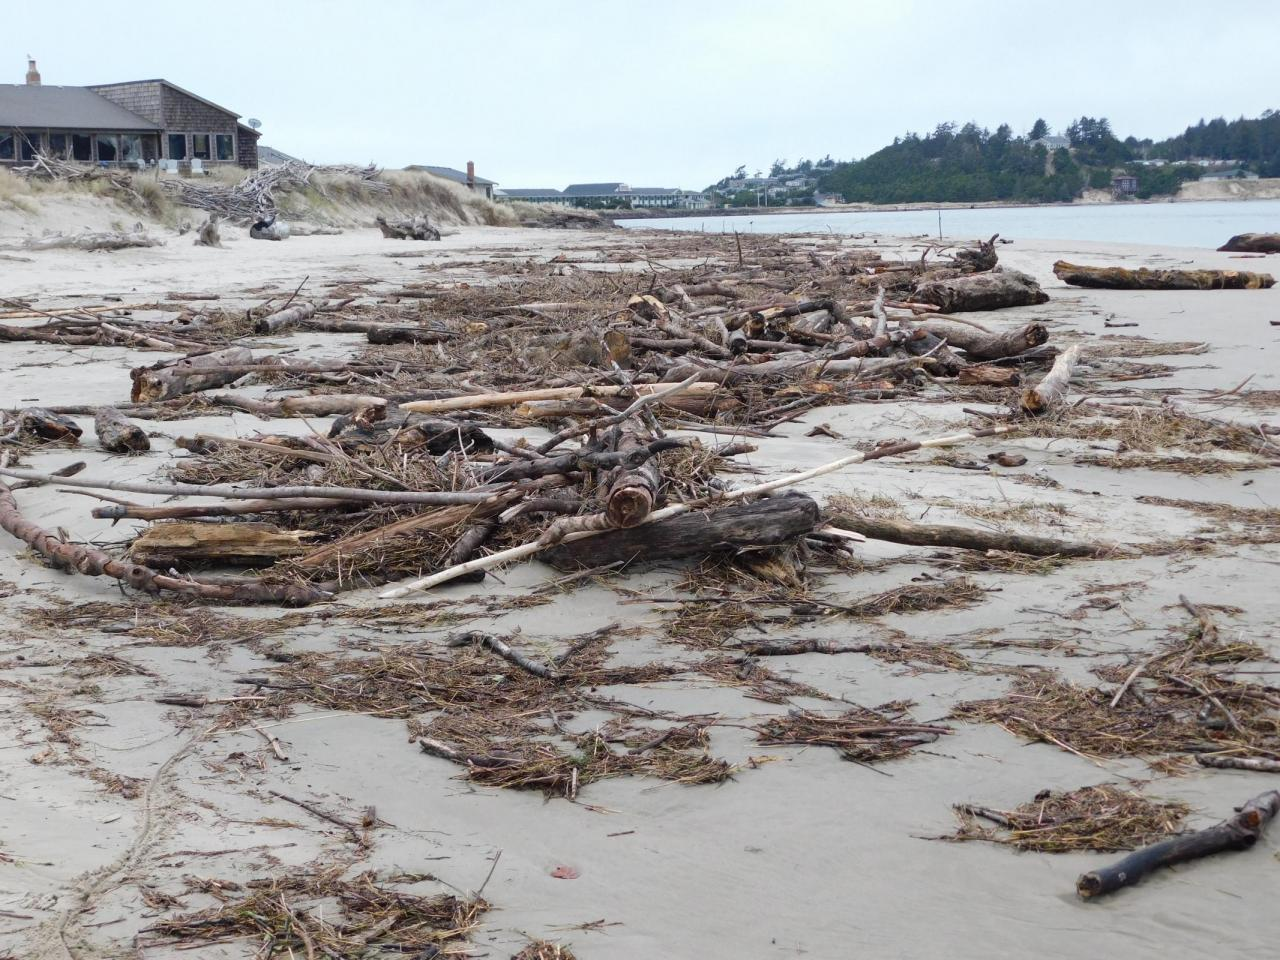 Driftwood at Alsea Bay